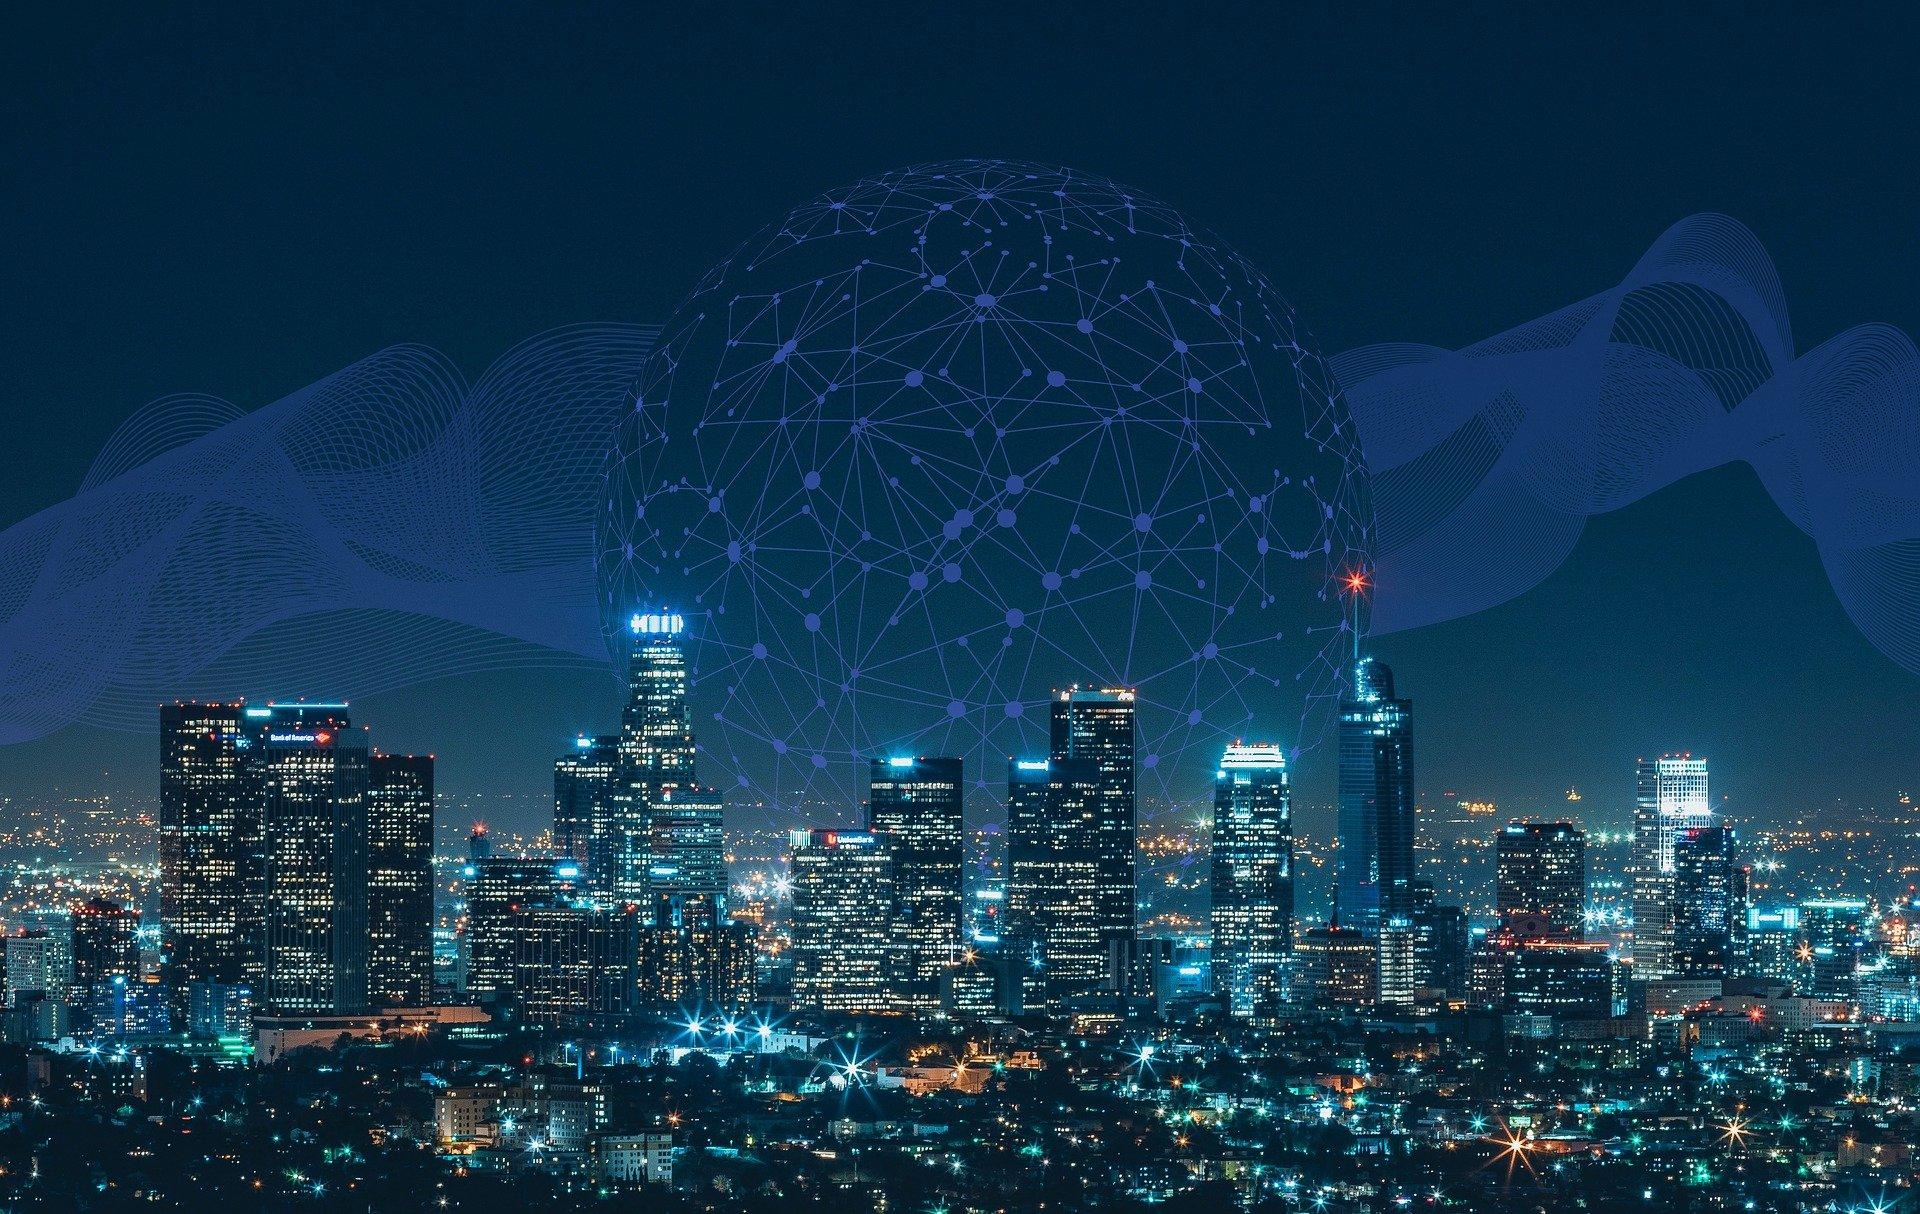 Transforming Smart Cities into Smart Urban Ecosystems